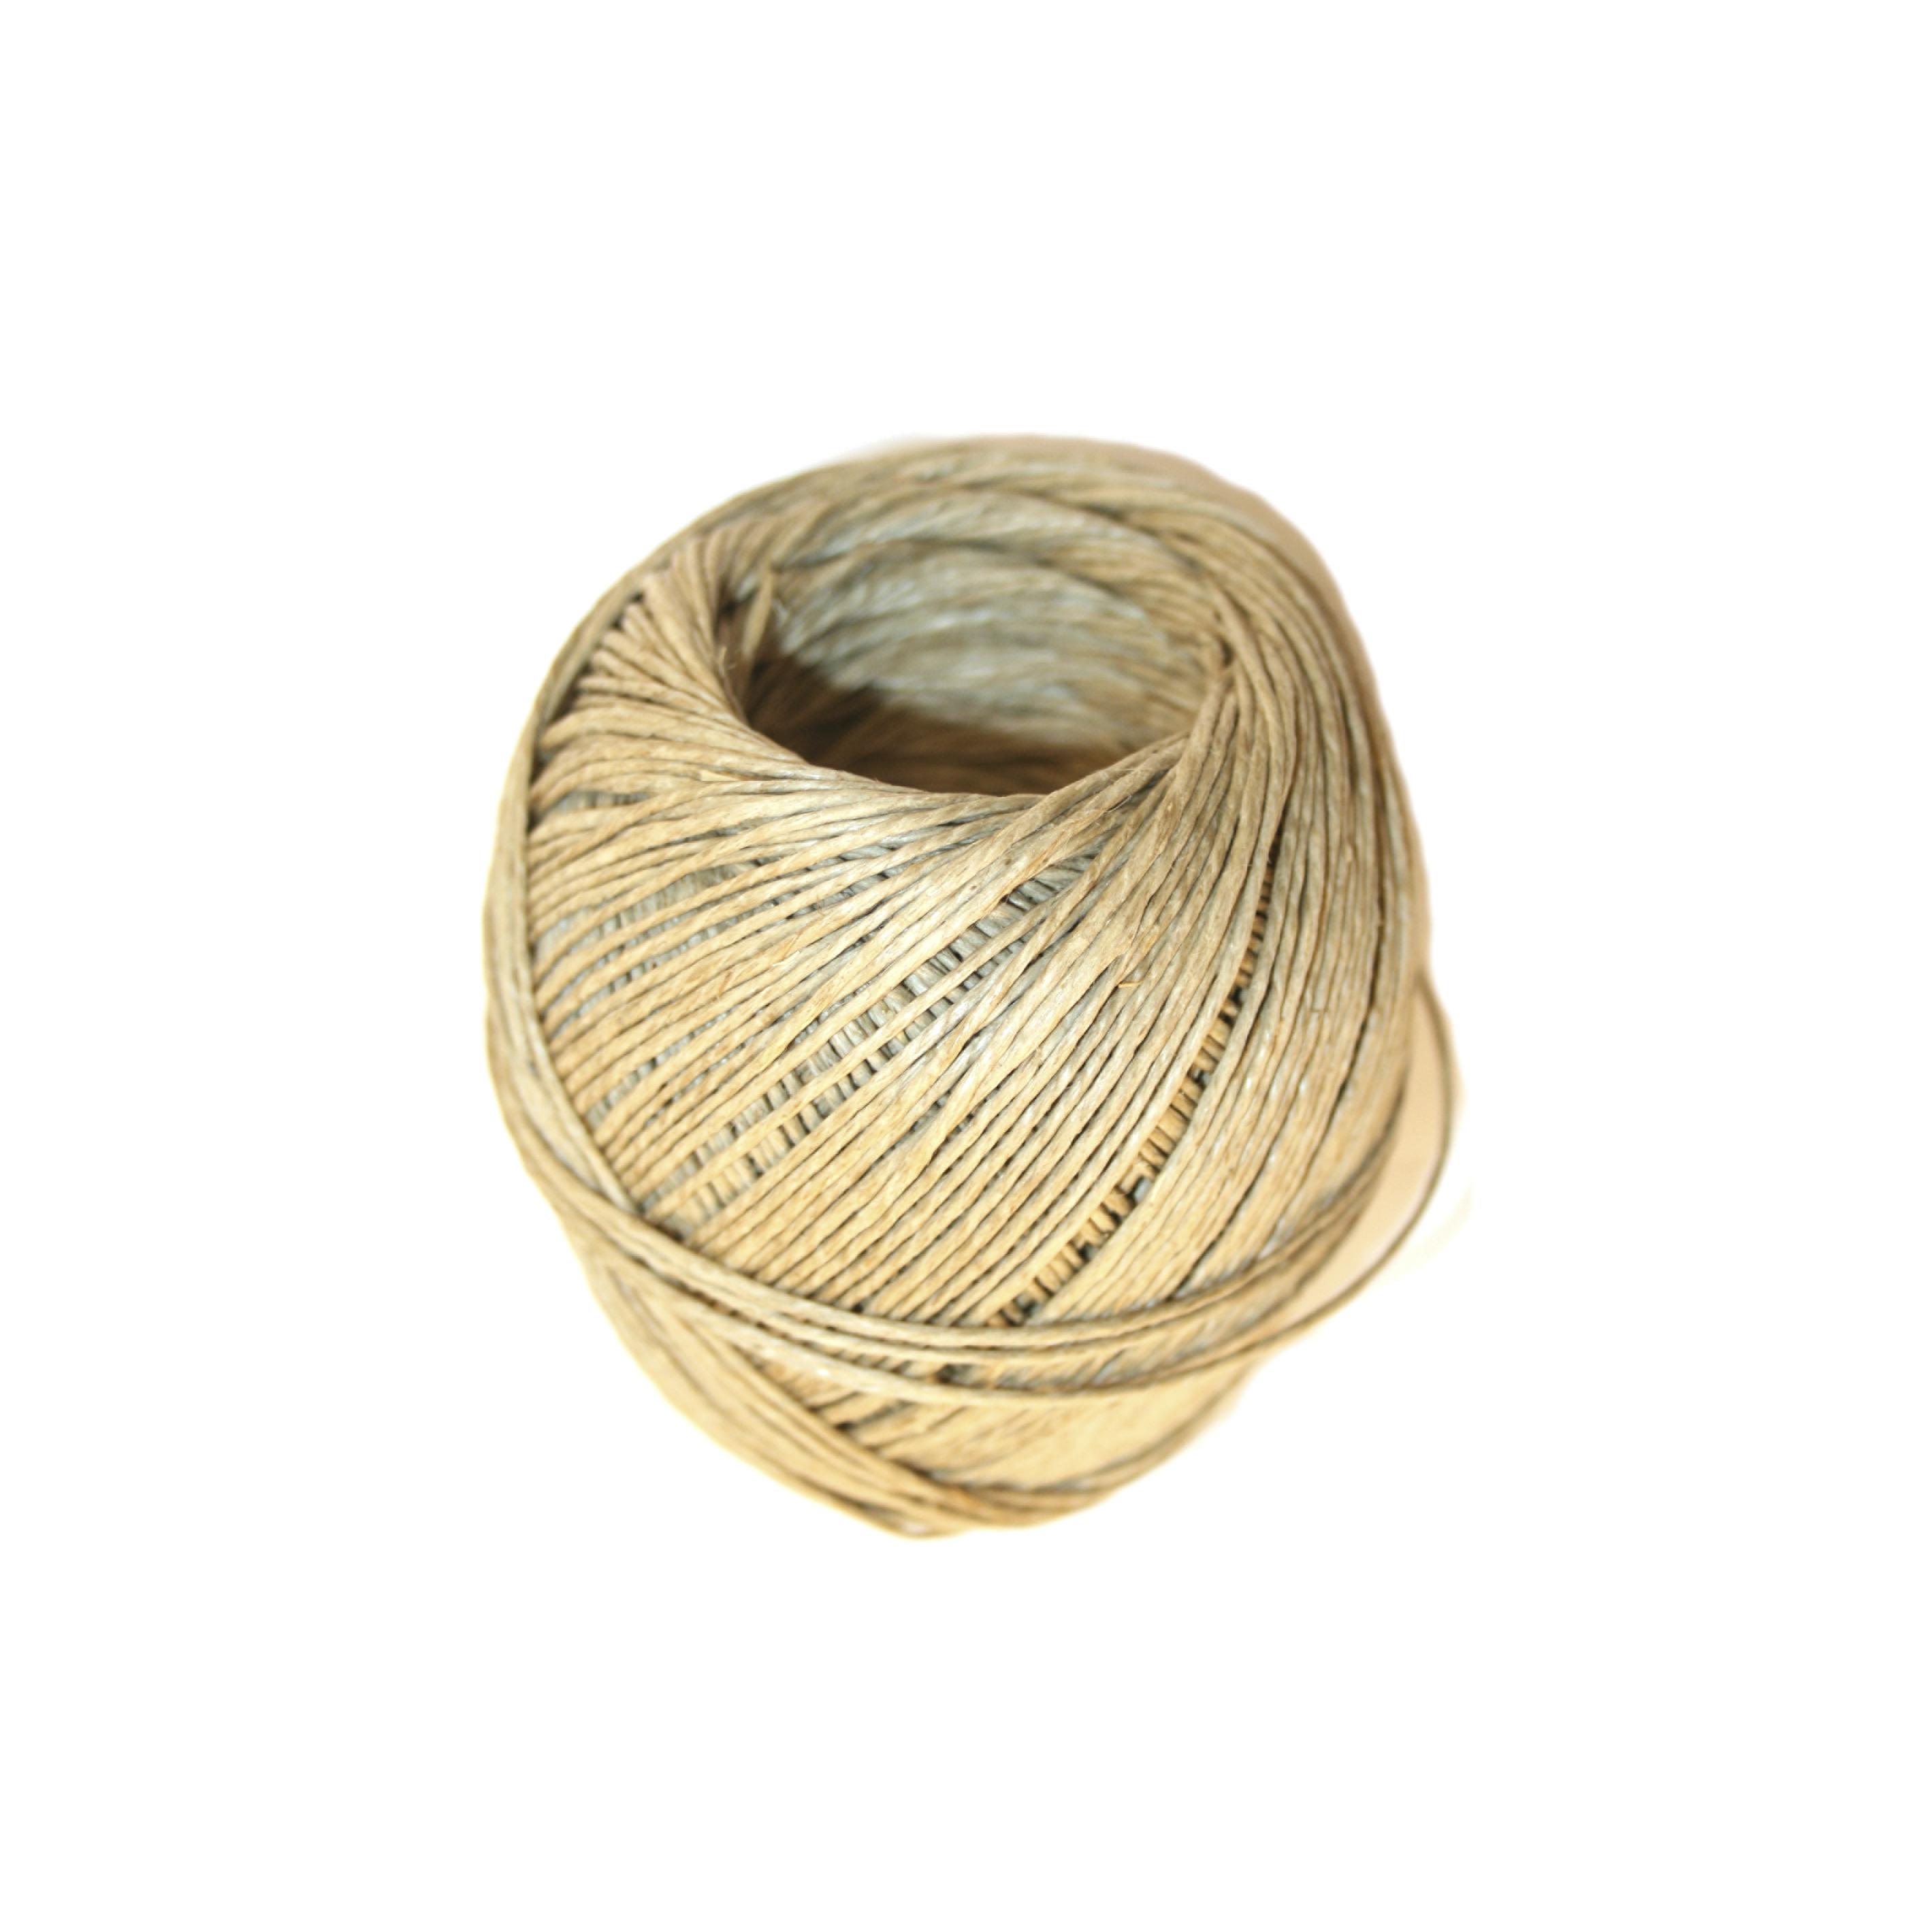 corde sisal 3 mm 150 m beige cordes cha nes mat riel. Black Bedroom Furniture Sets. Home Design Ideas